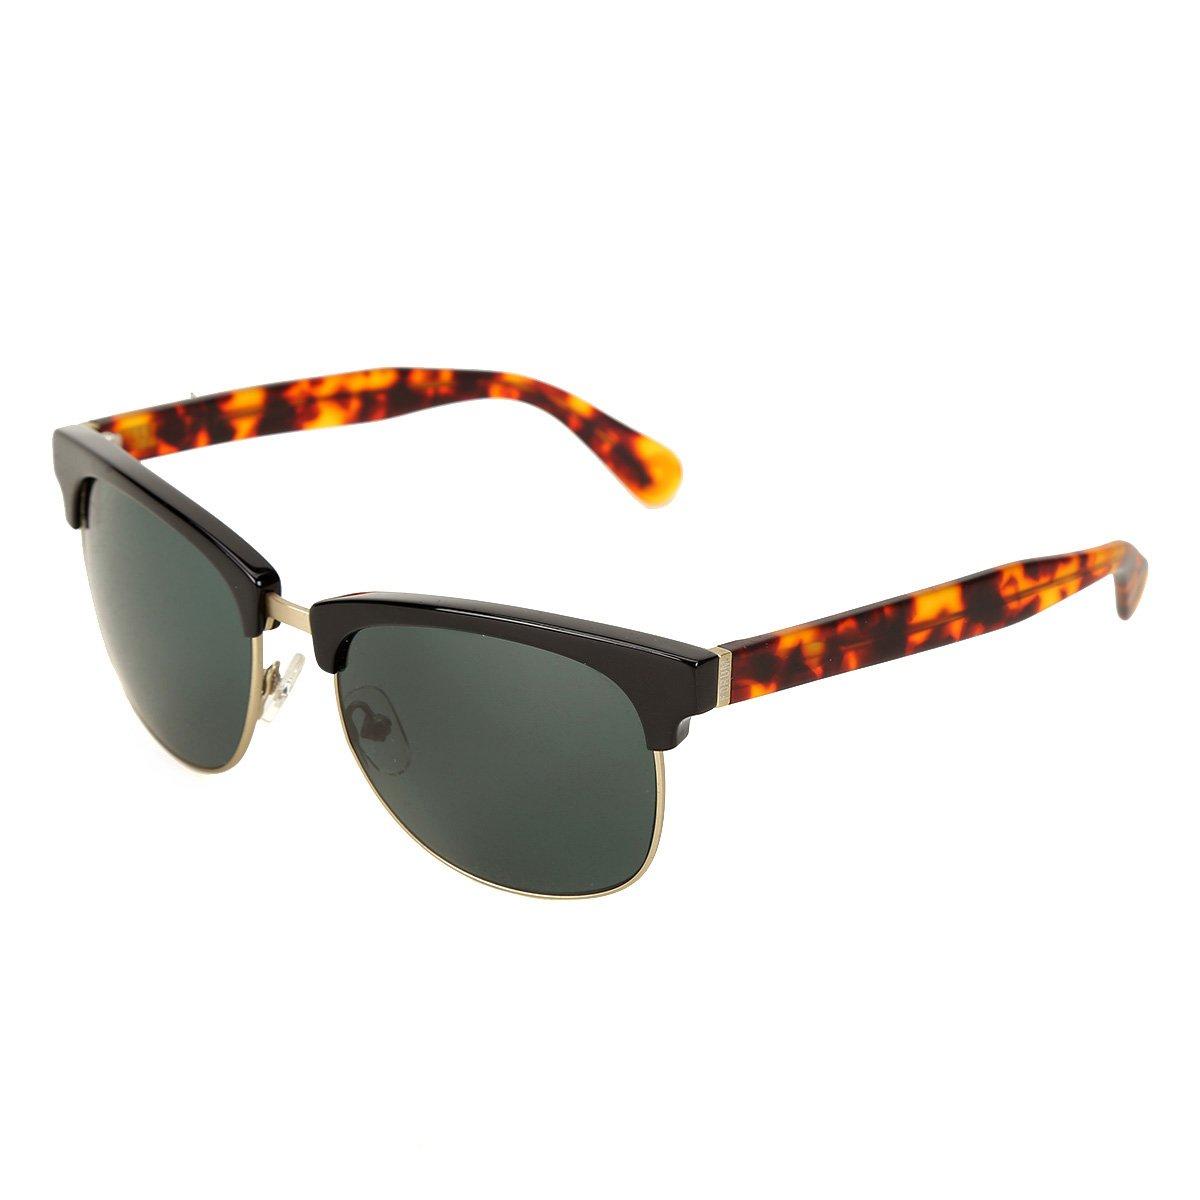 2d4ef63f63369 Óculos de Sol Forum Tartaruga Feminino - Compre Agora   Zattini